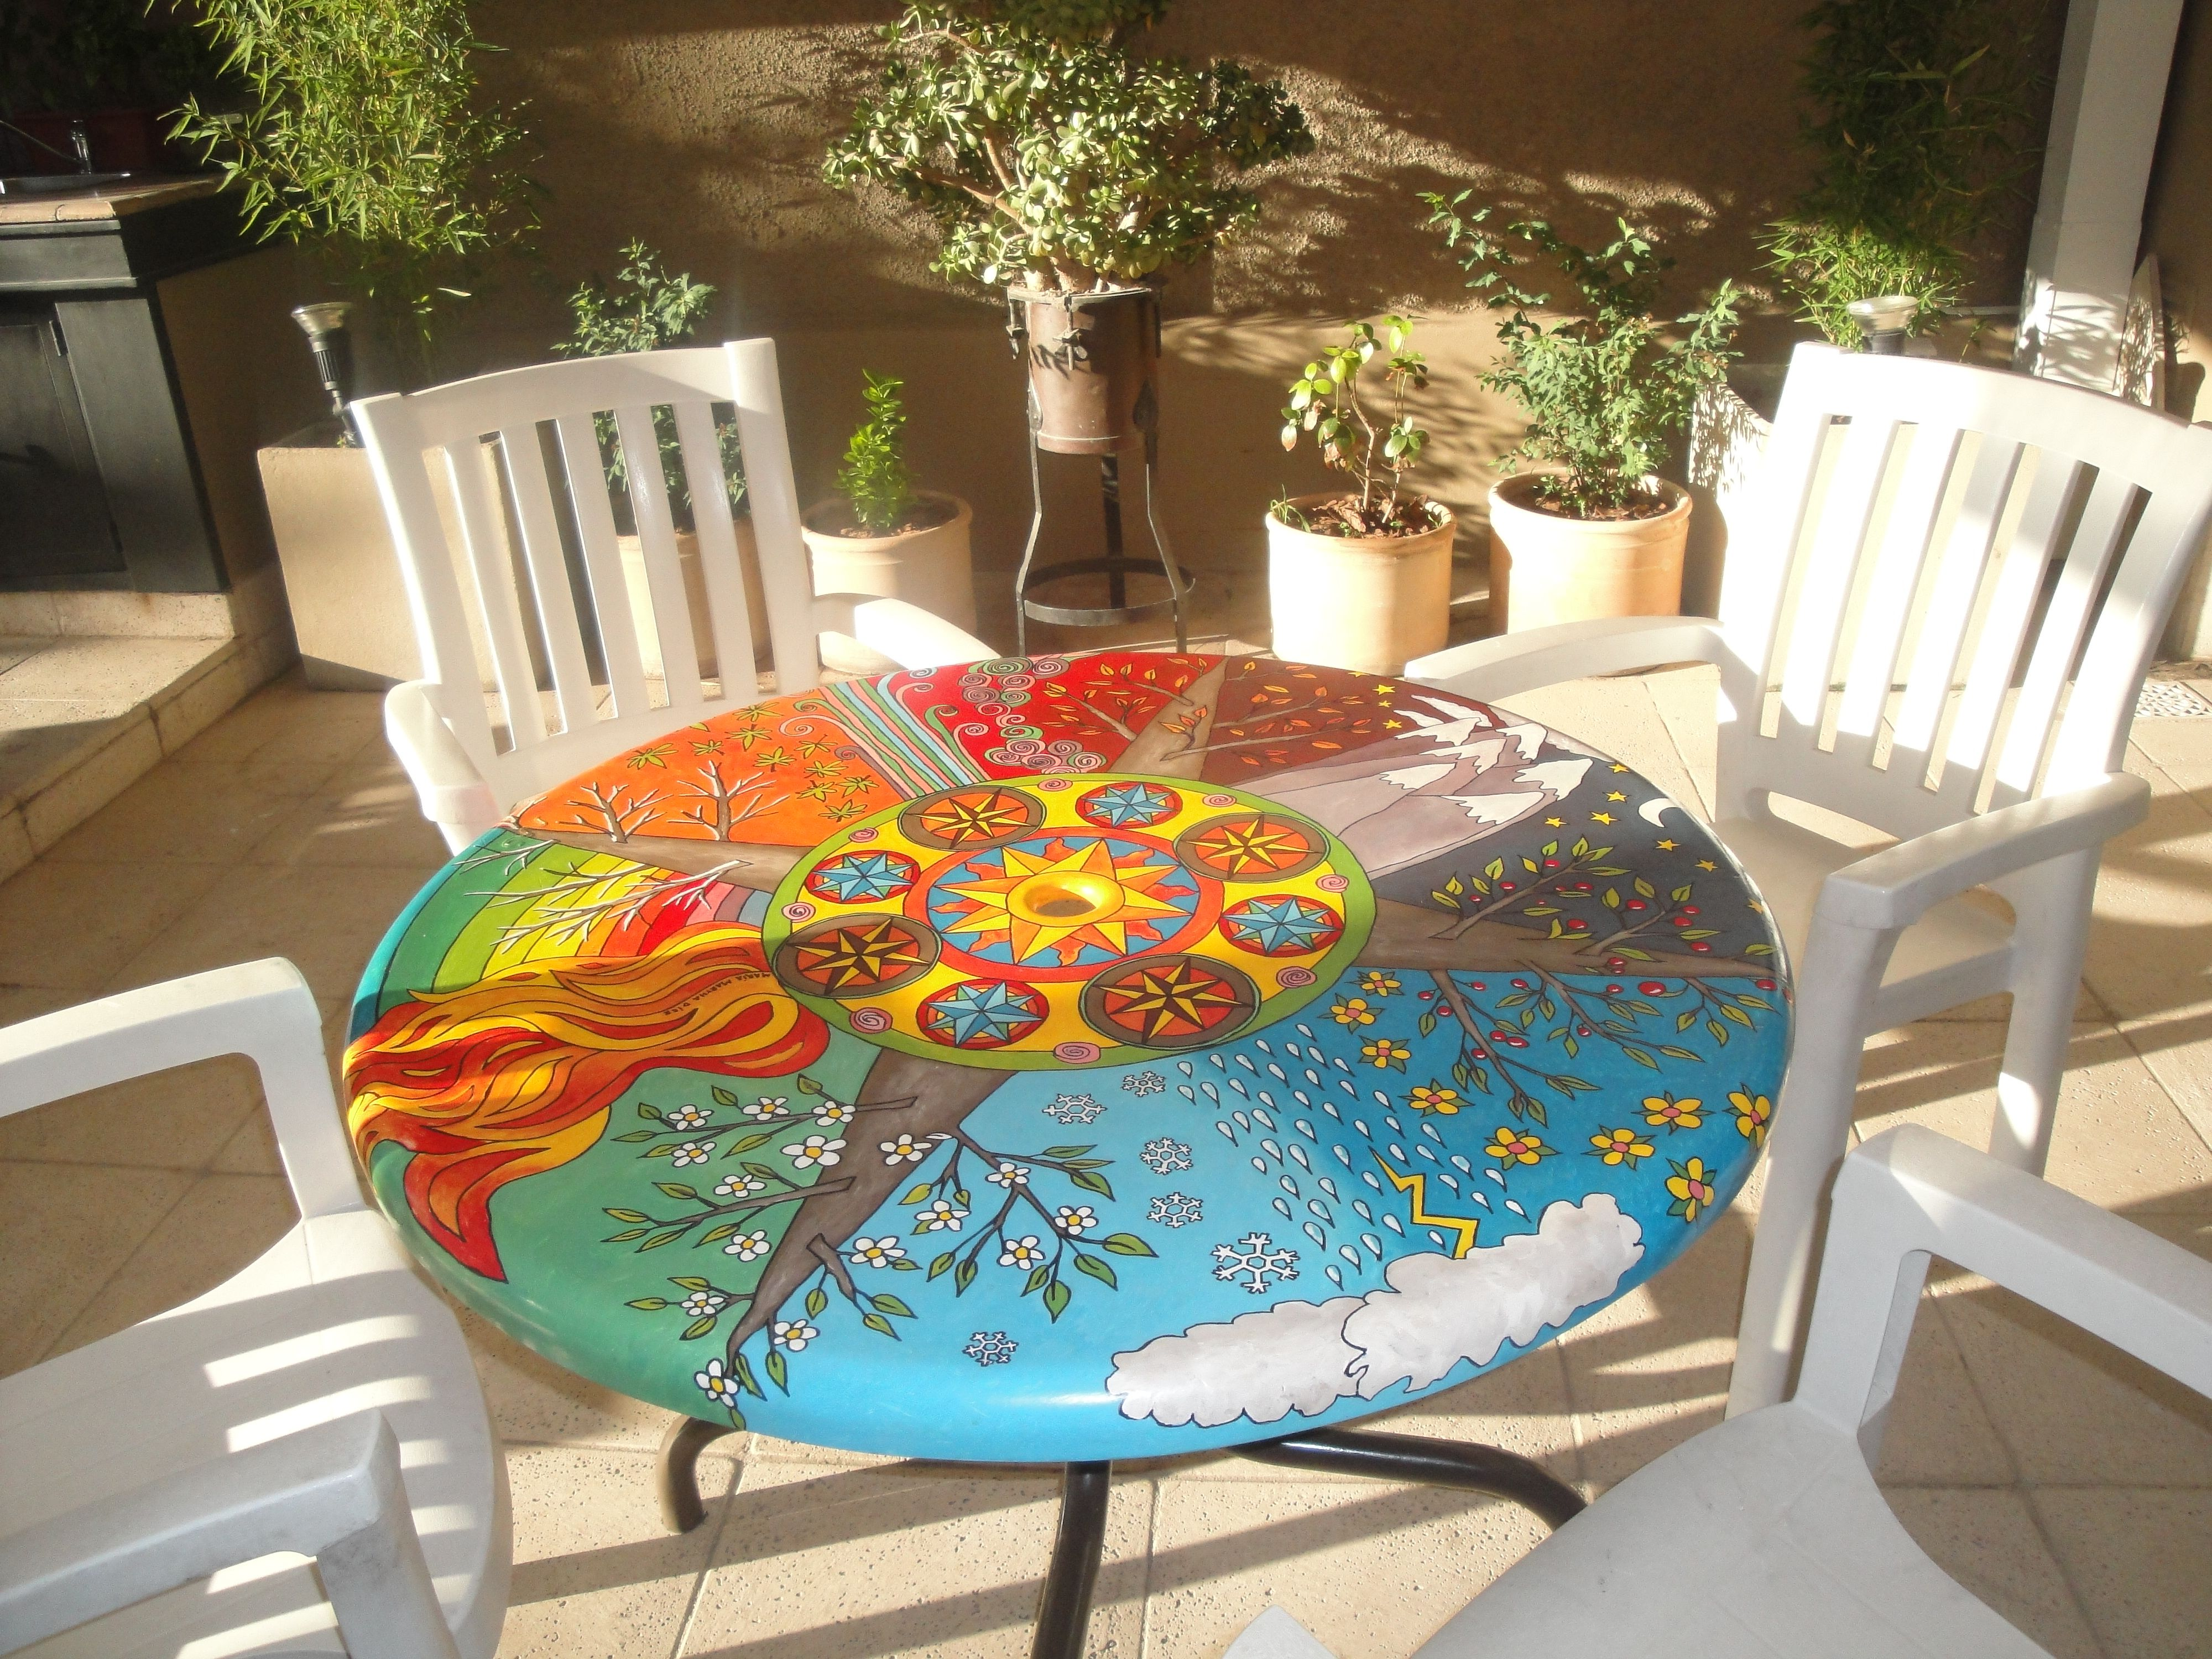 Mandala pintado sobre mesa de jard n autora maria martha diez mandalas pinterest for Articulos para decorar jardines